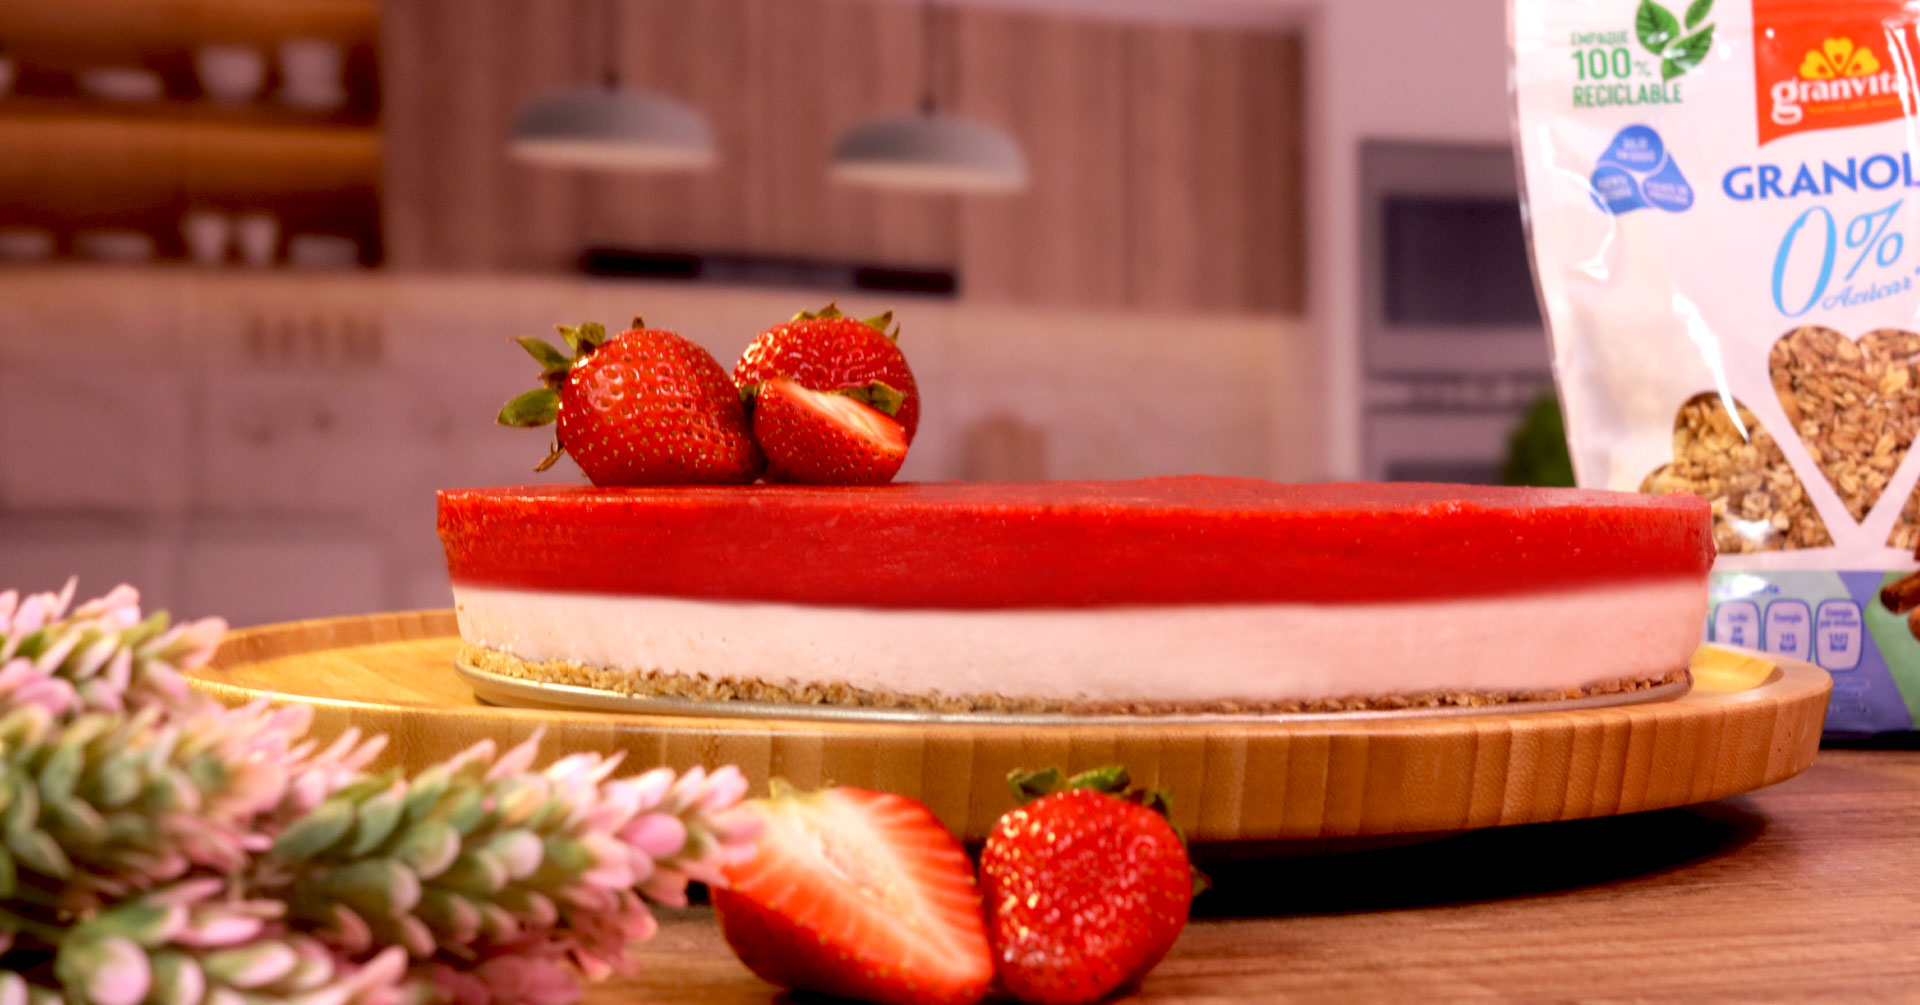 Prepara un delicioso cheesecake de fresa con granola